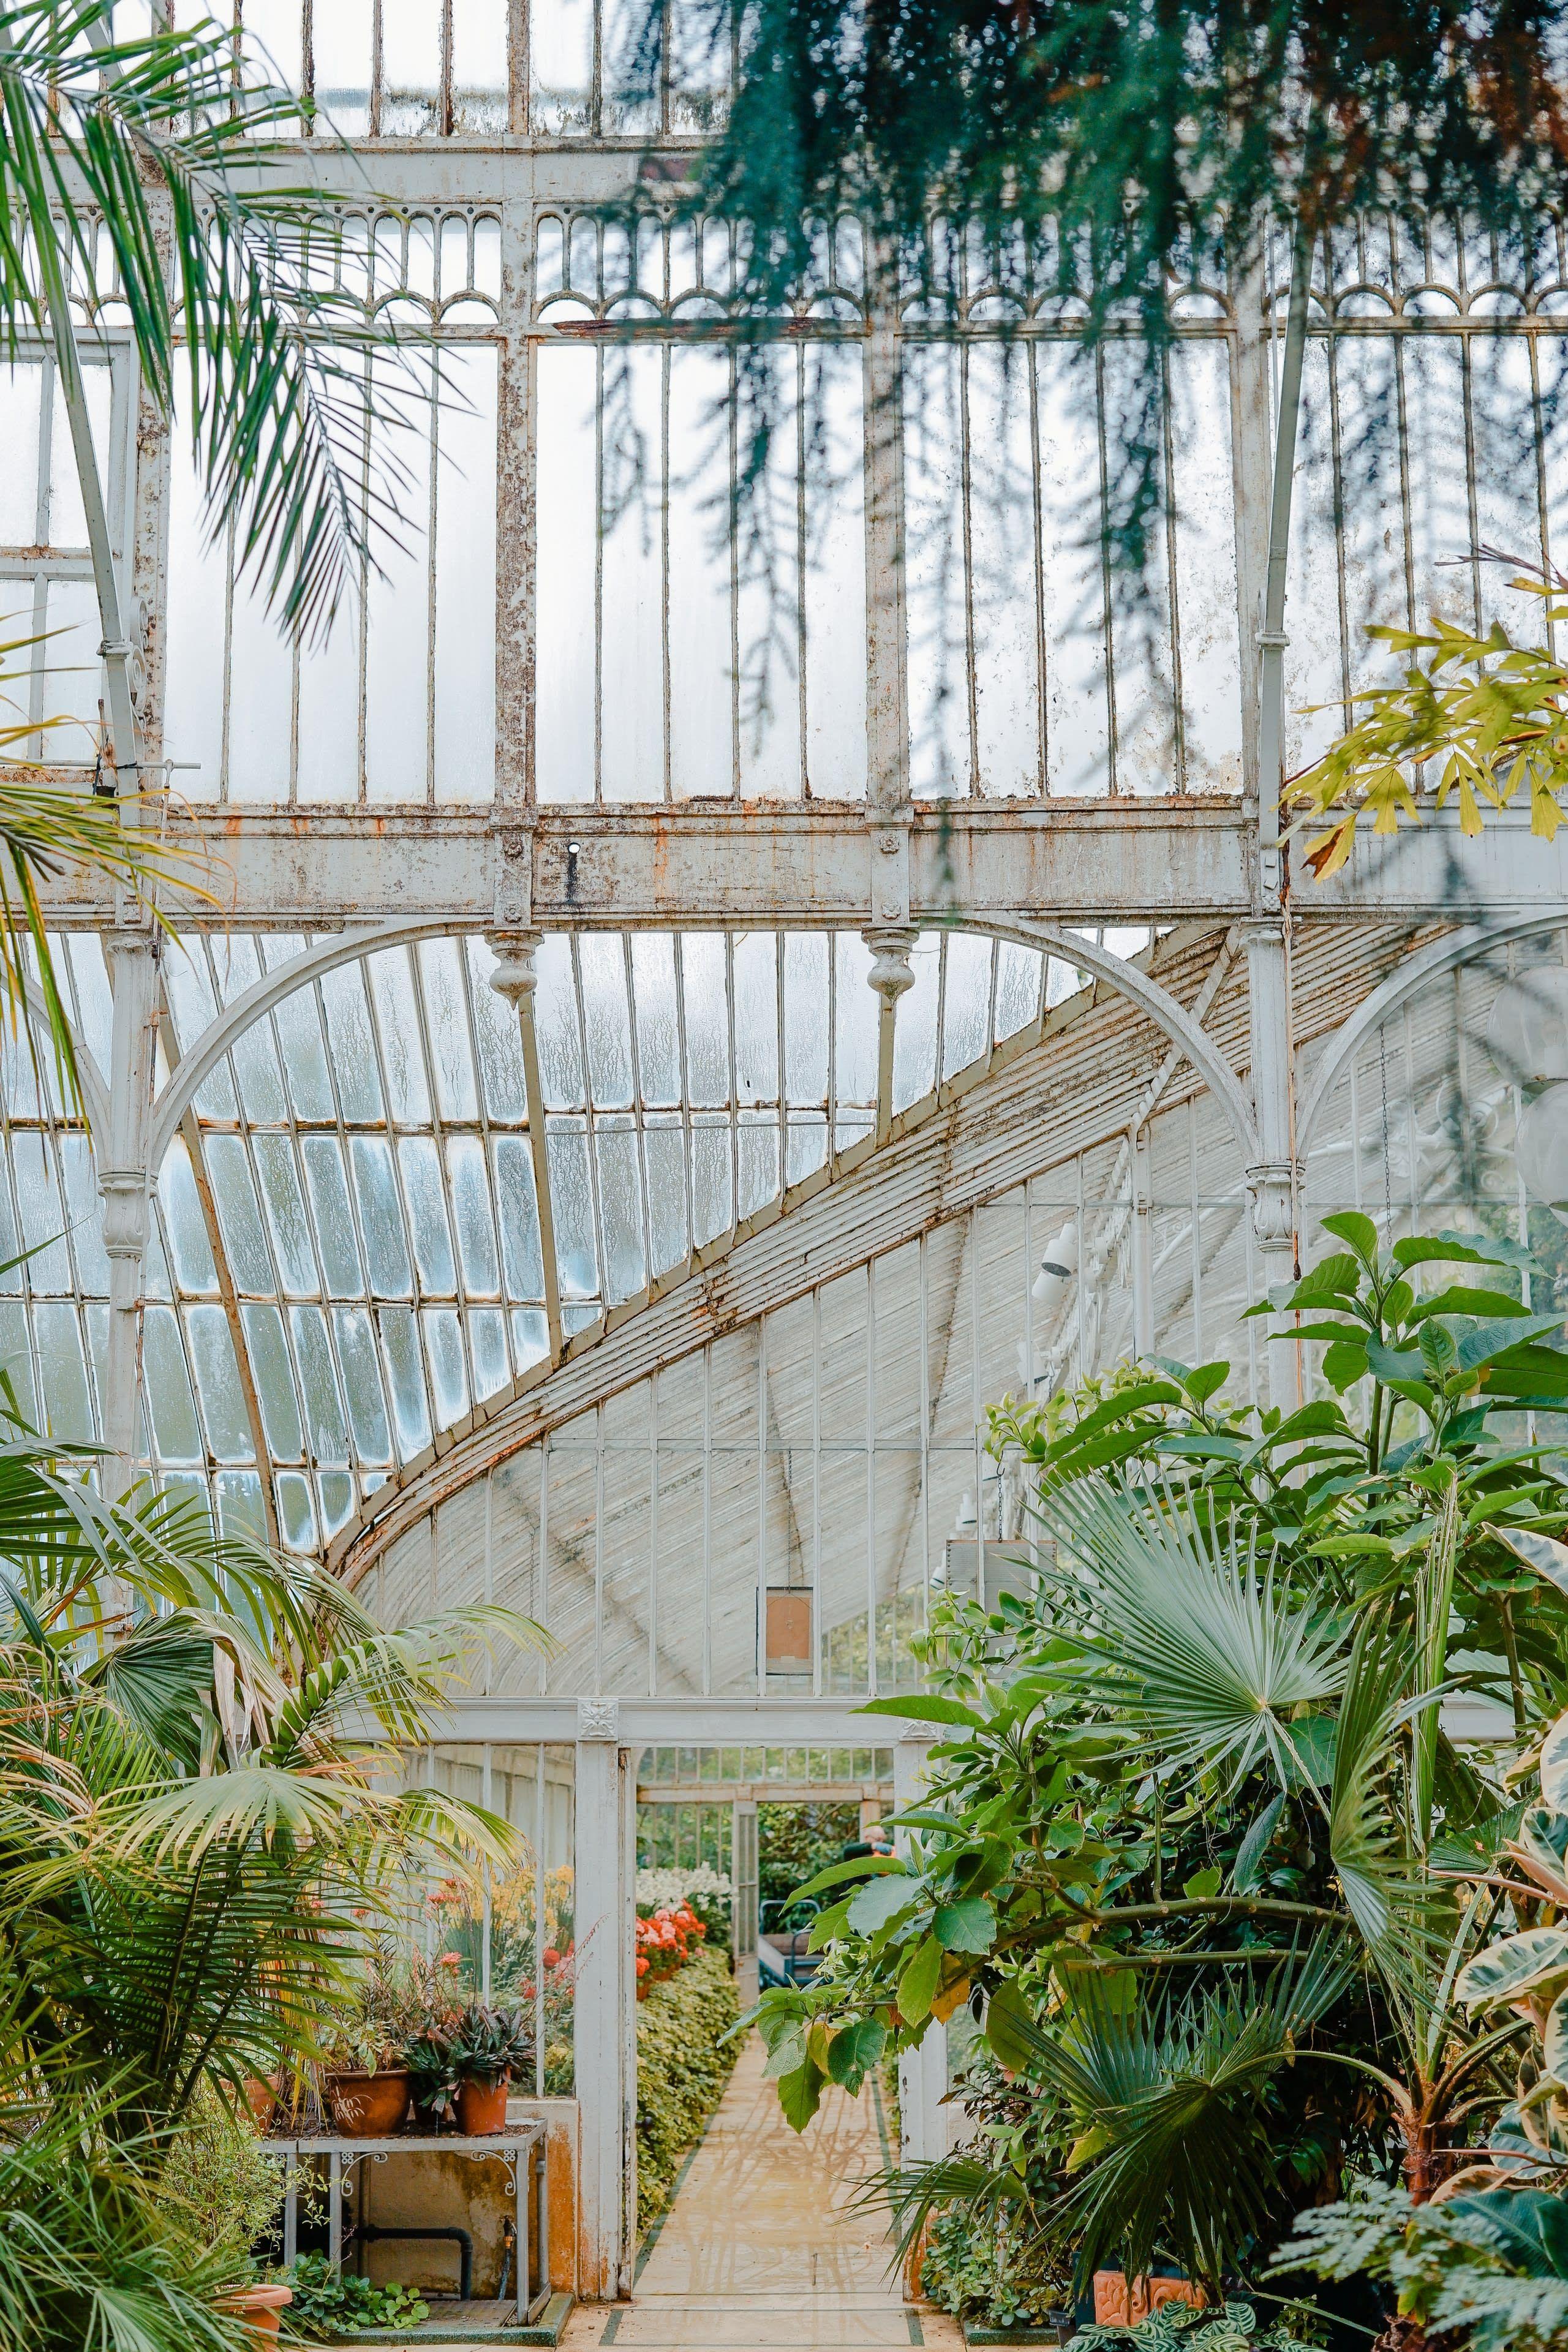 Royal Botanical Gardens Plant Sale 2019